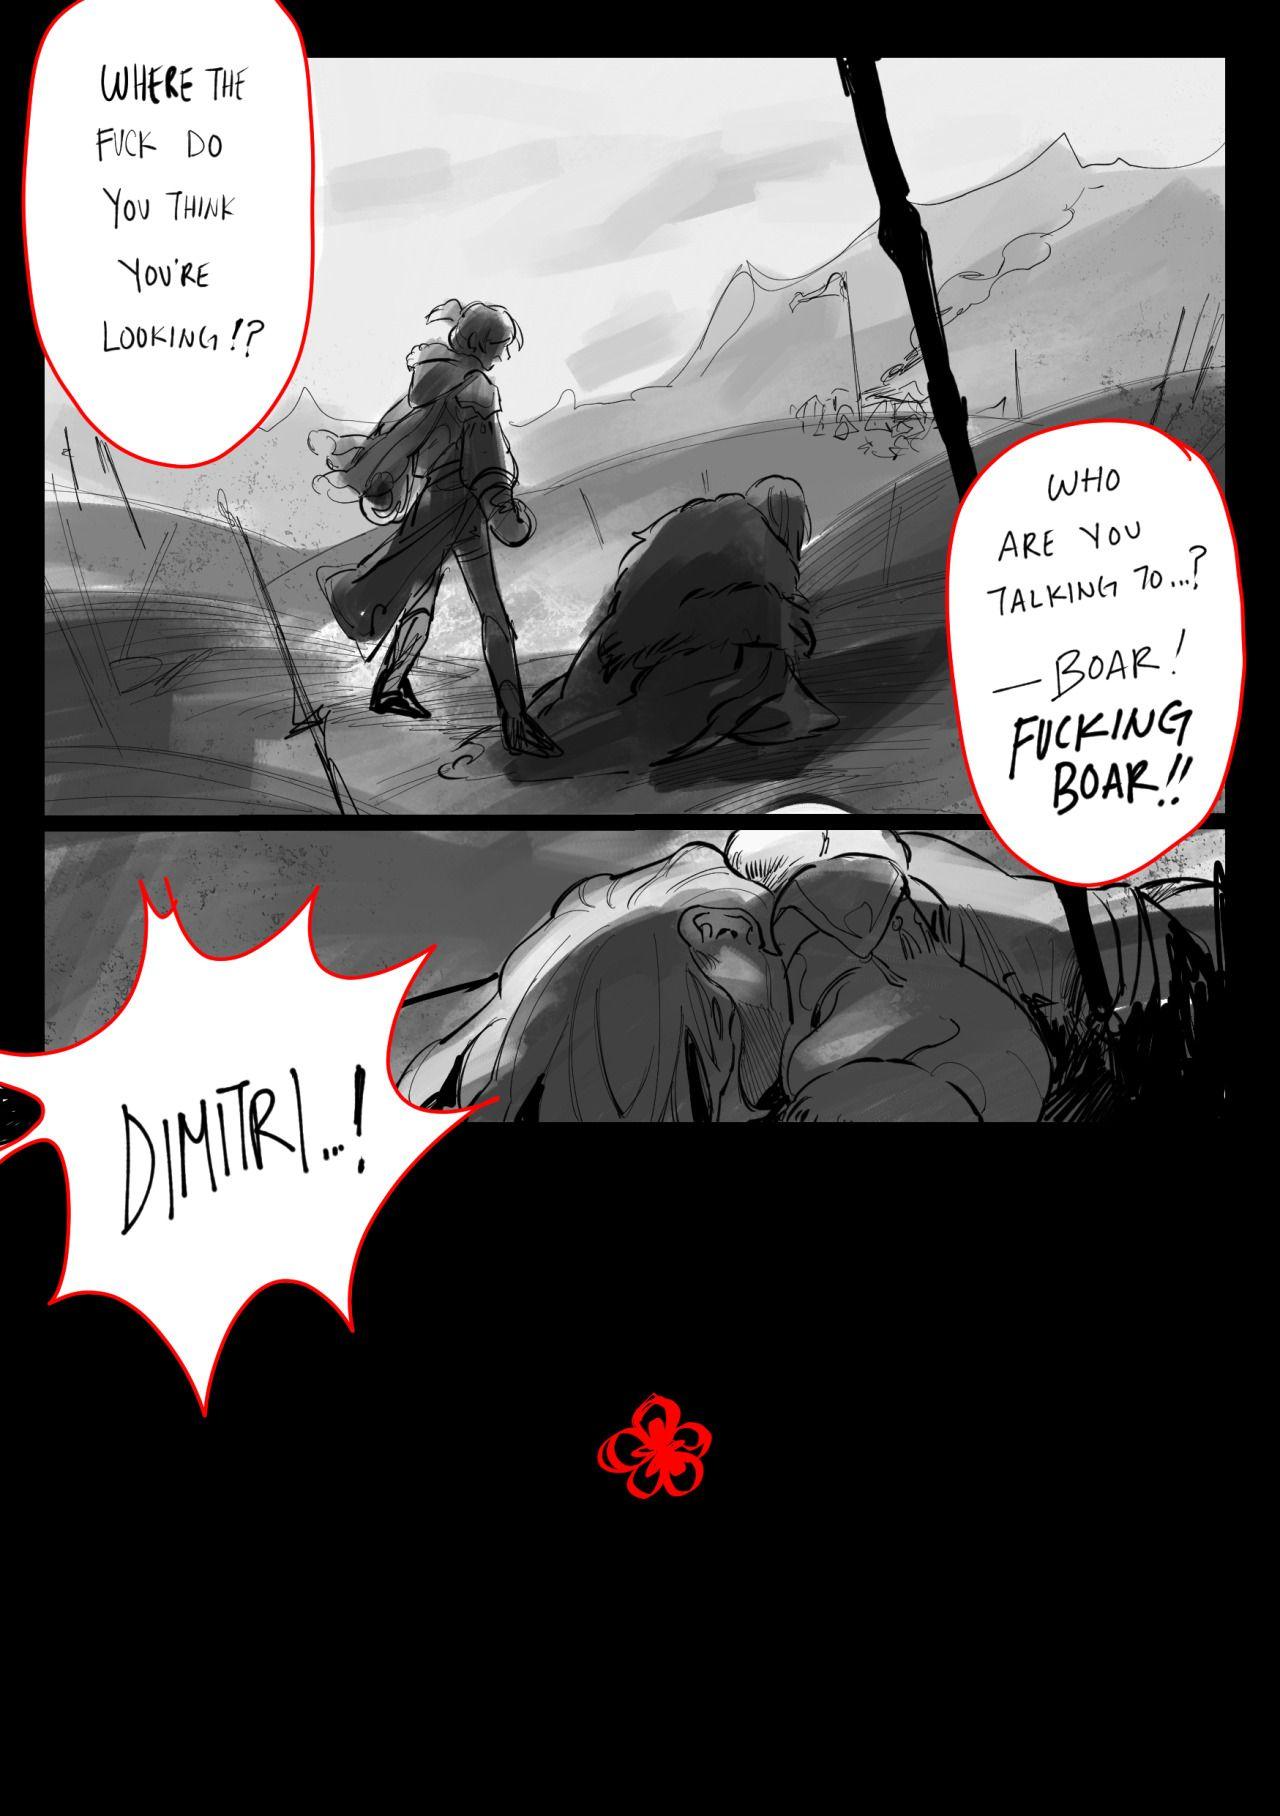 dimitri-alexandre-blaiddyd | Tumblr